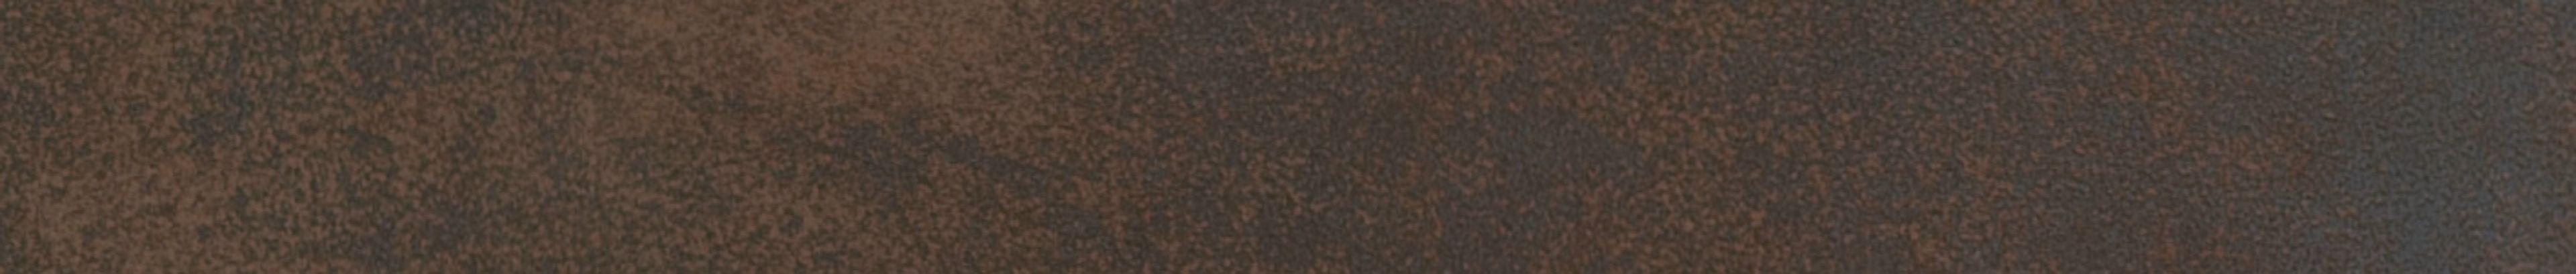 rev tement de sol mur cologique effet cuir edge brown by ceramiche keope. Black Bedroom Furniture Sets. Home Design Ideas